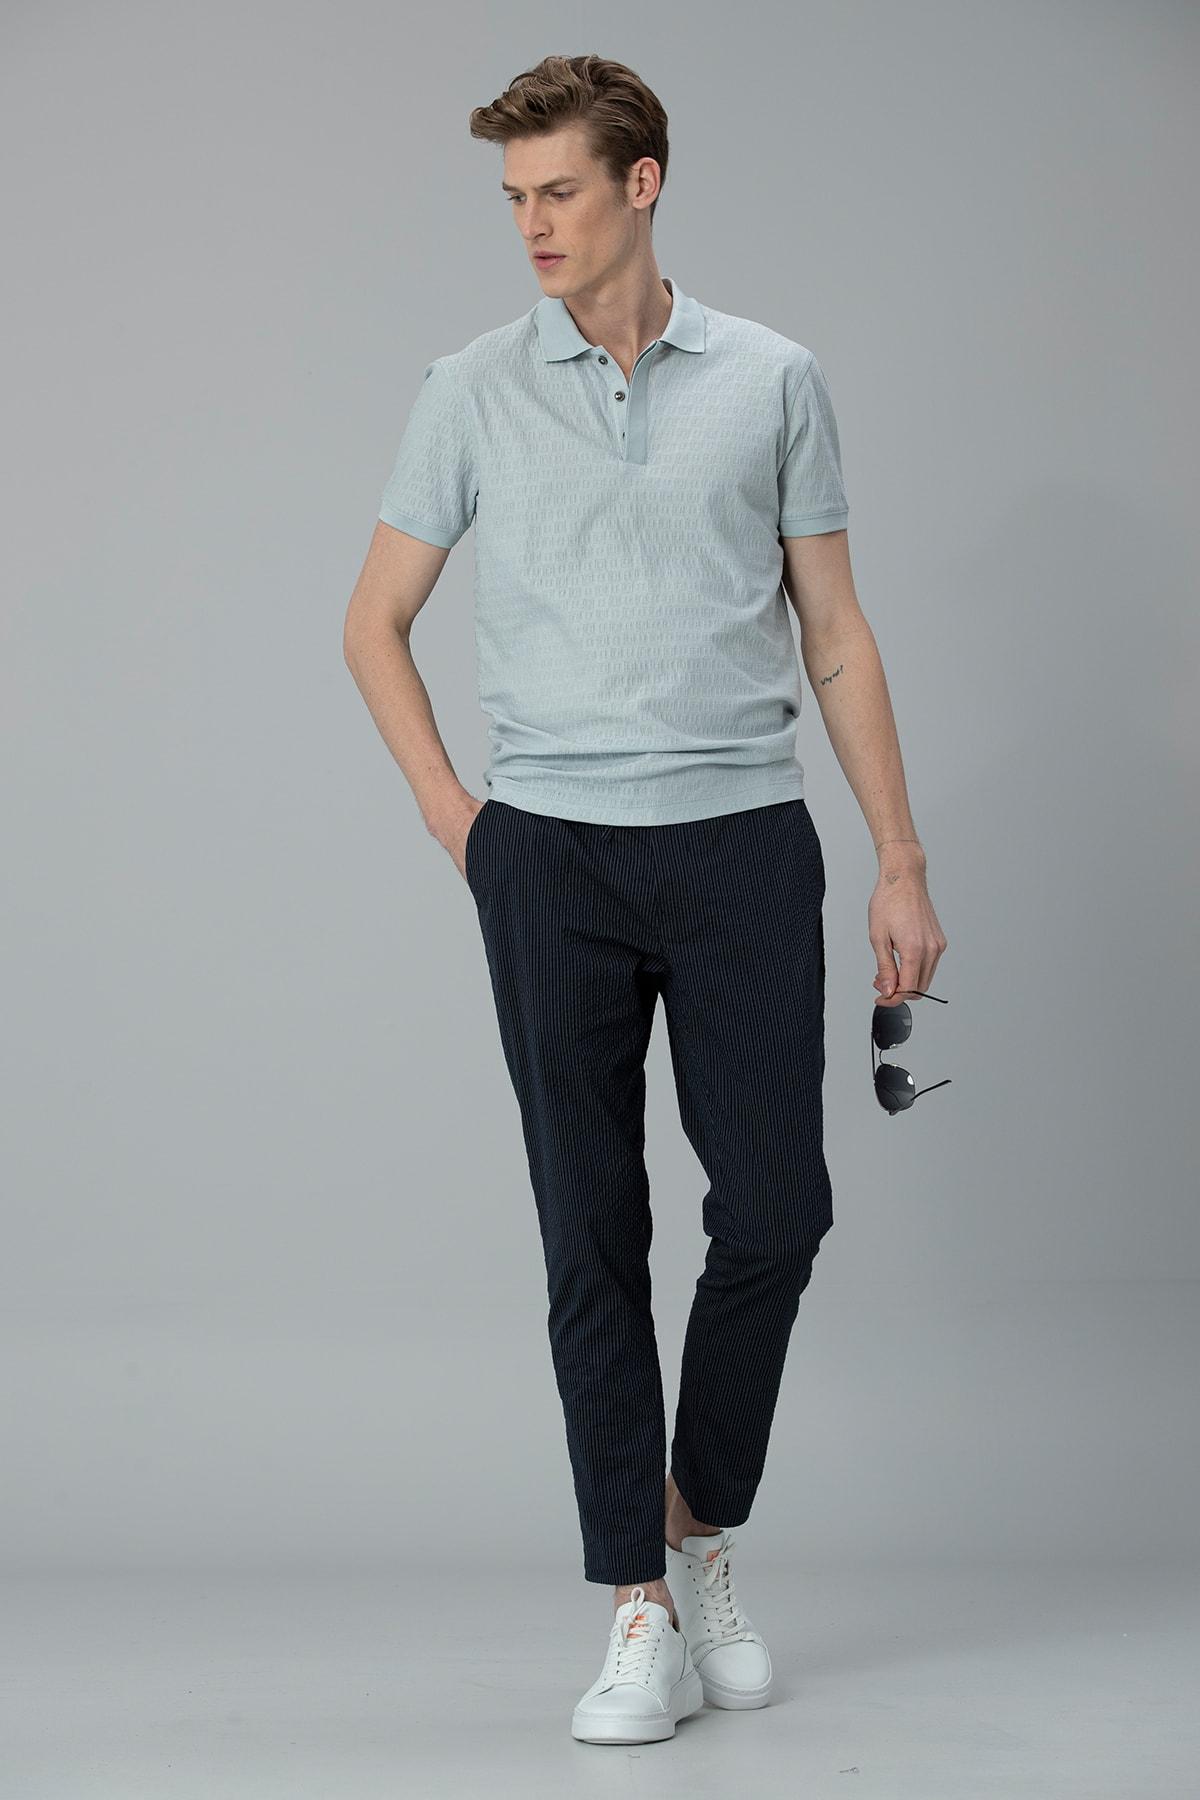 Lufian Clar Spor Polo T- Shirt Açık Nane 2